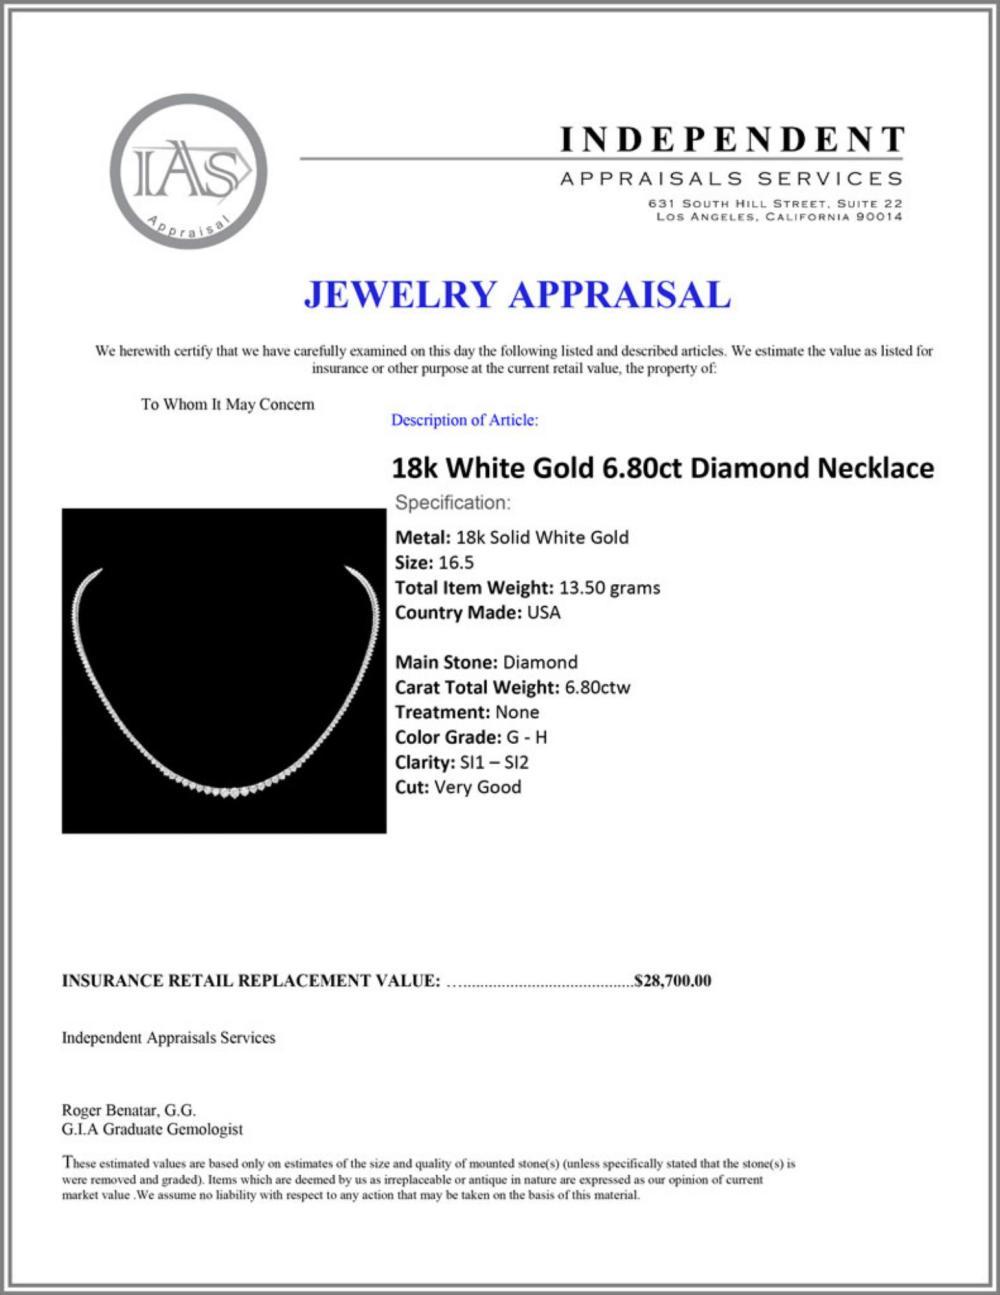 Lot 108: ^18k White Gold 6.80ct Diamond Necklace